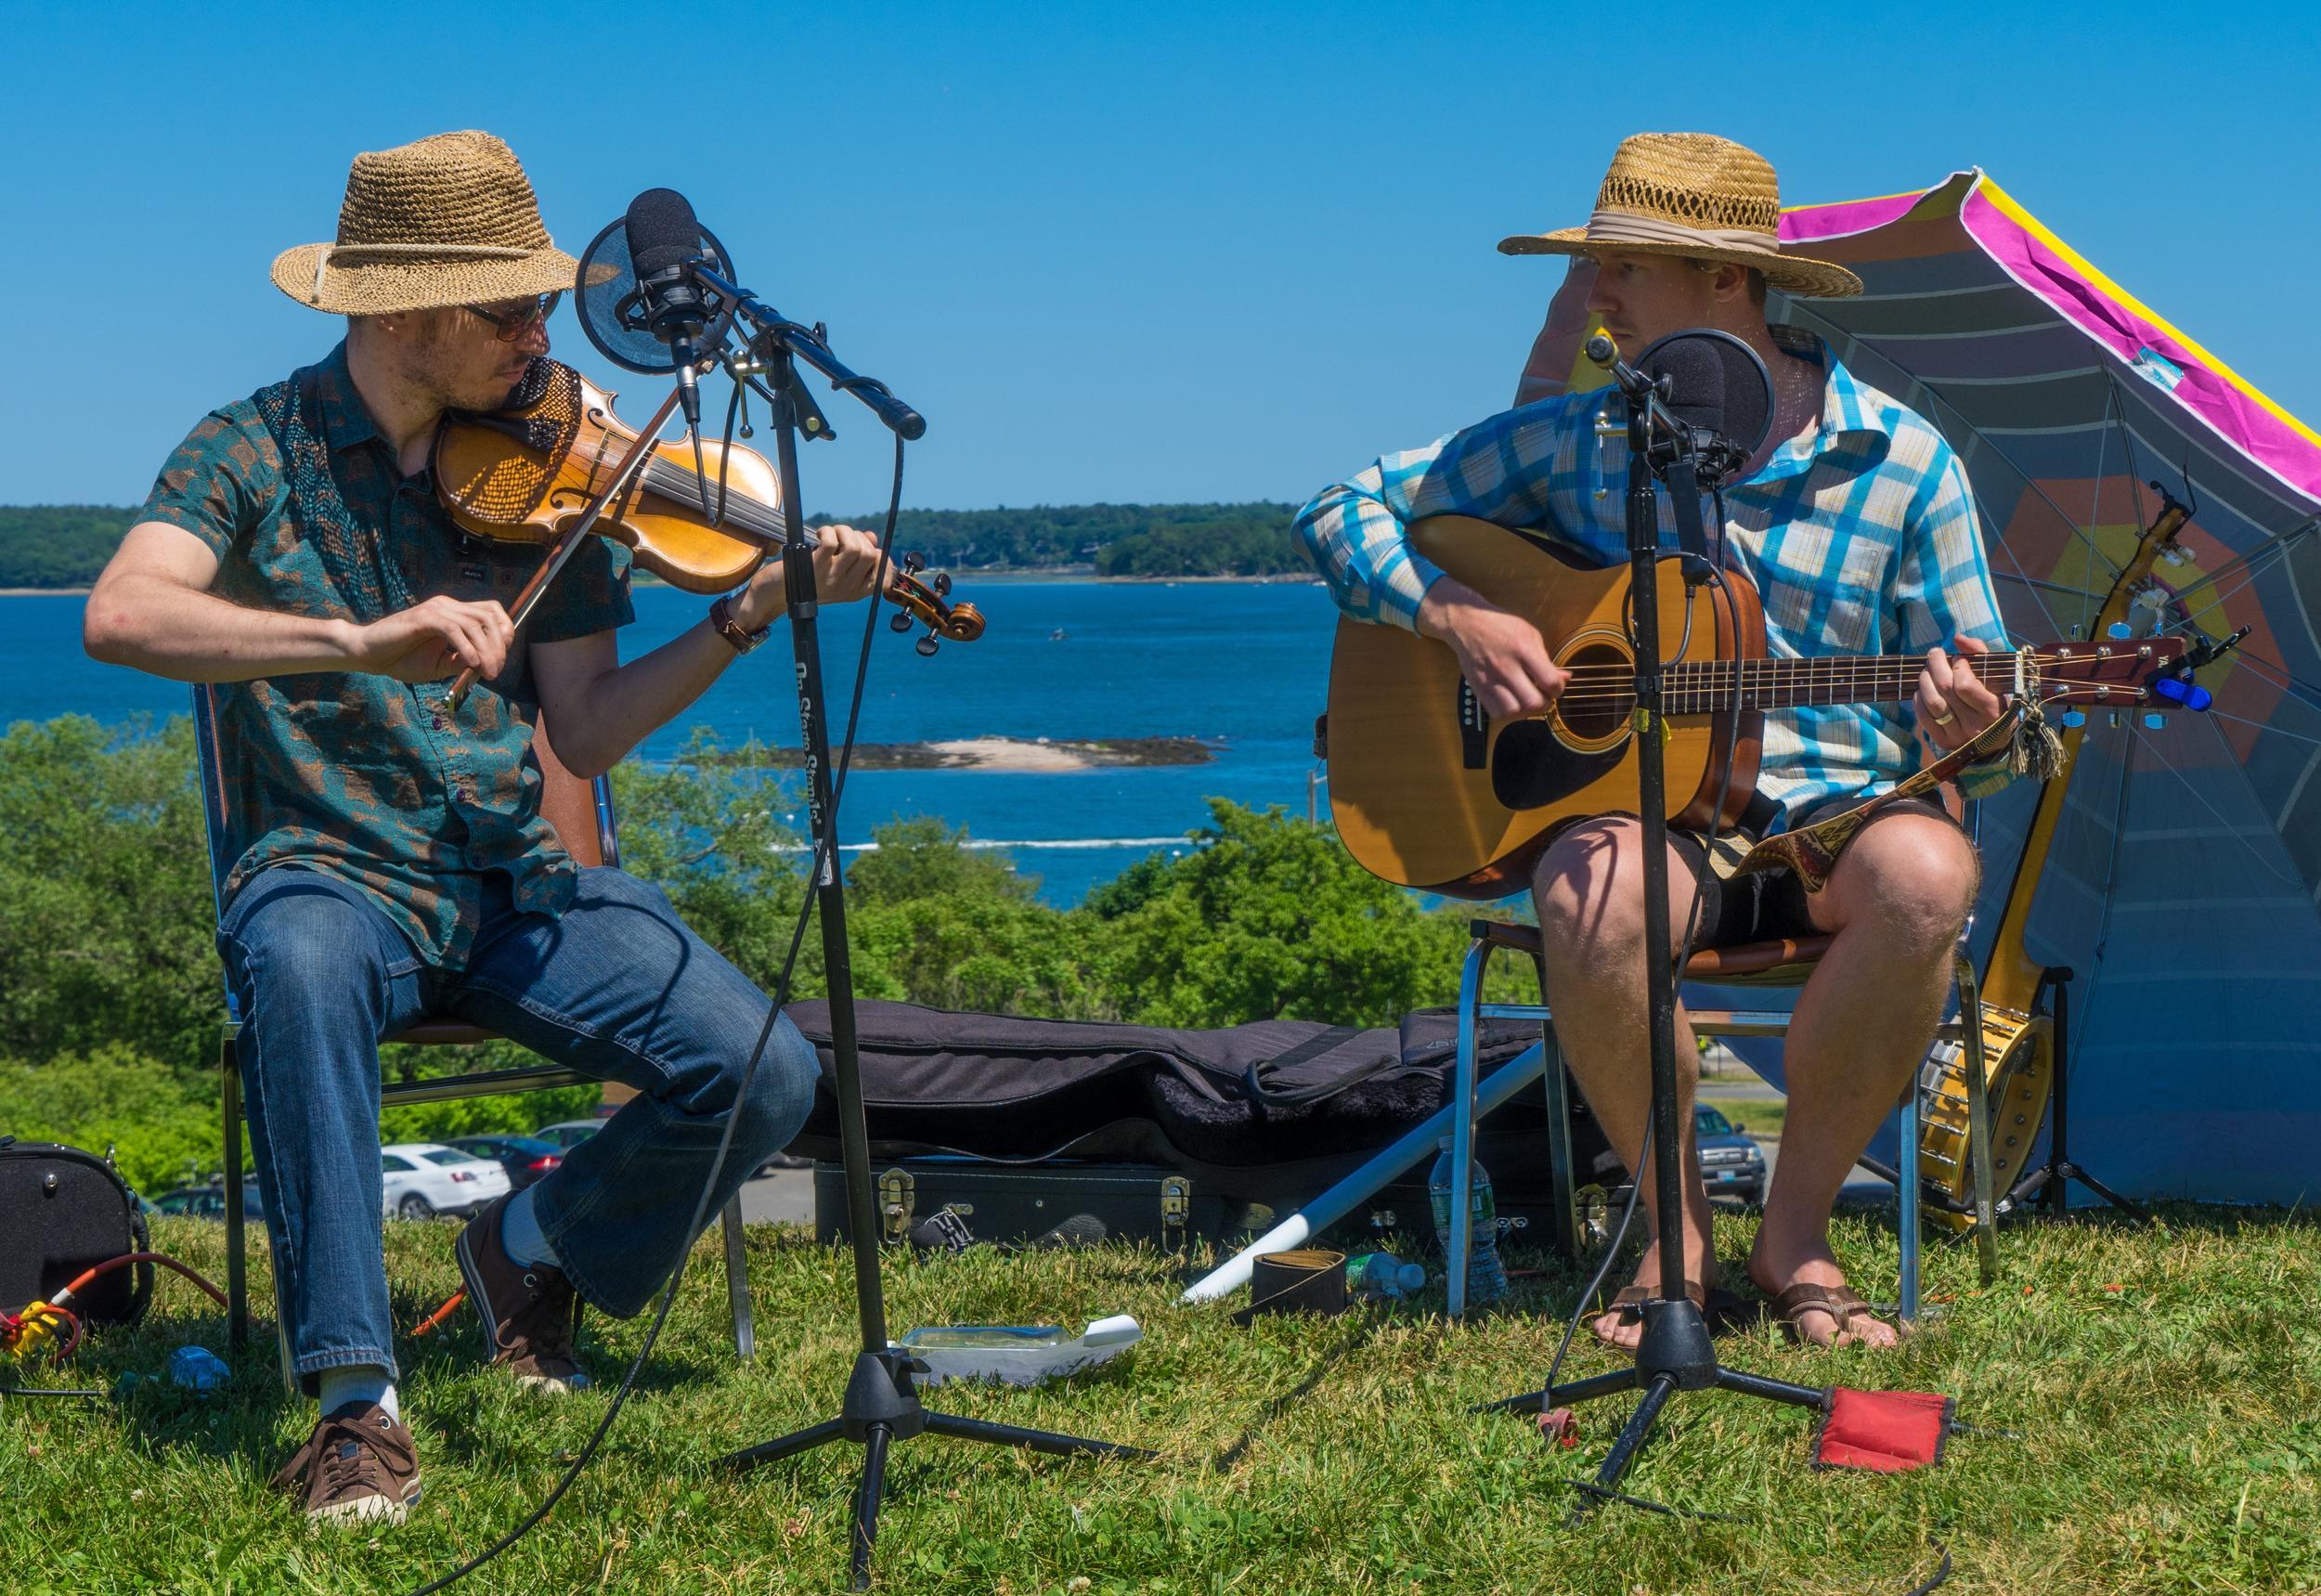 Folk musicians at Funjoy. Photo by Kevin Schochat.